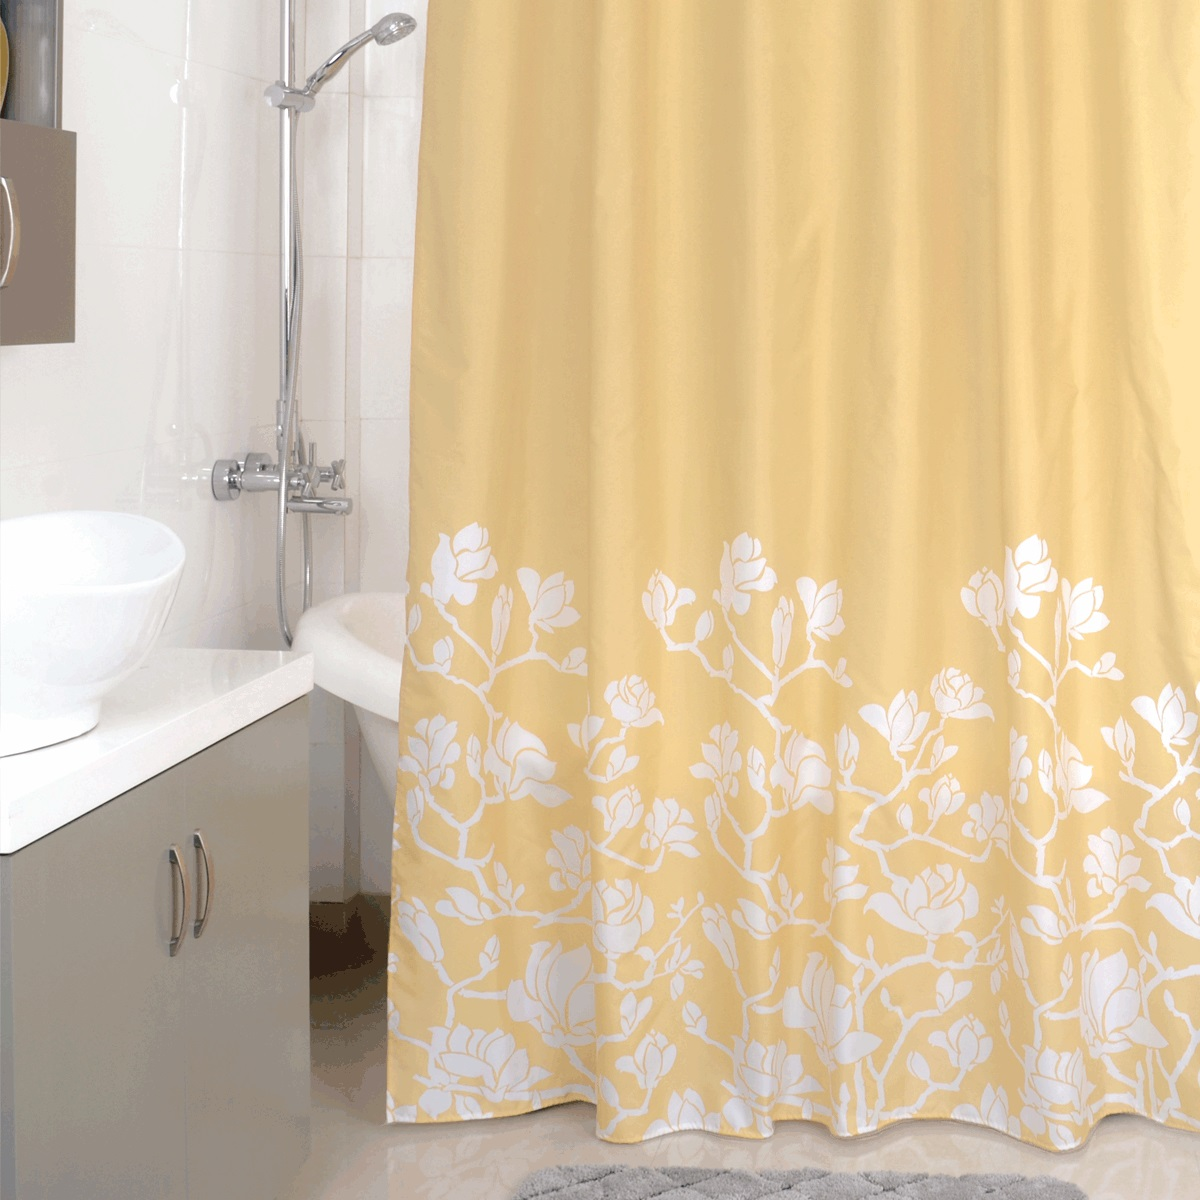 Штора для ванной Milardo Beige Silhouette, цвет: бежевый , 180 x 200 см milardo amur amusb00m01